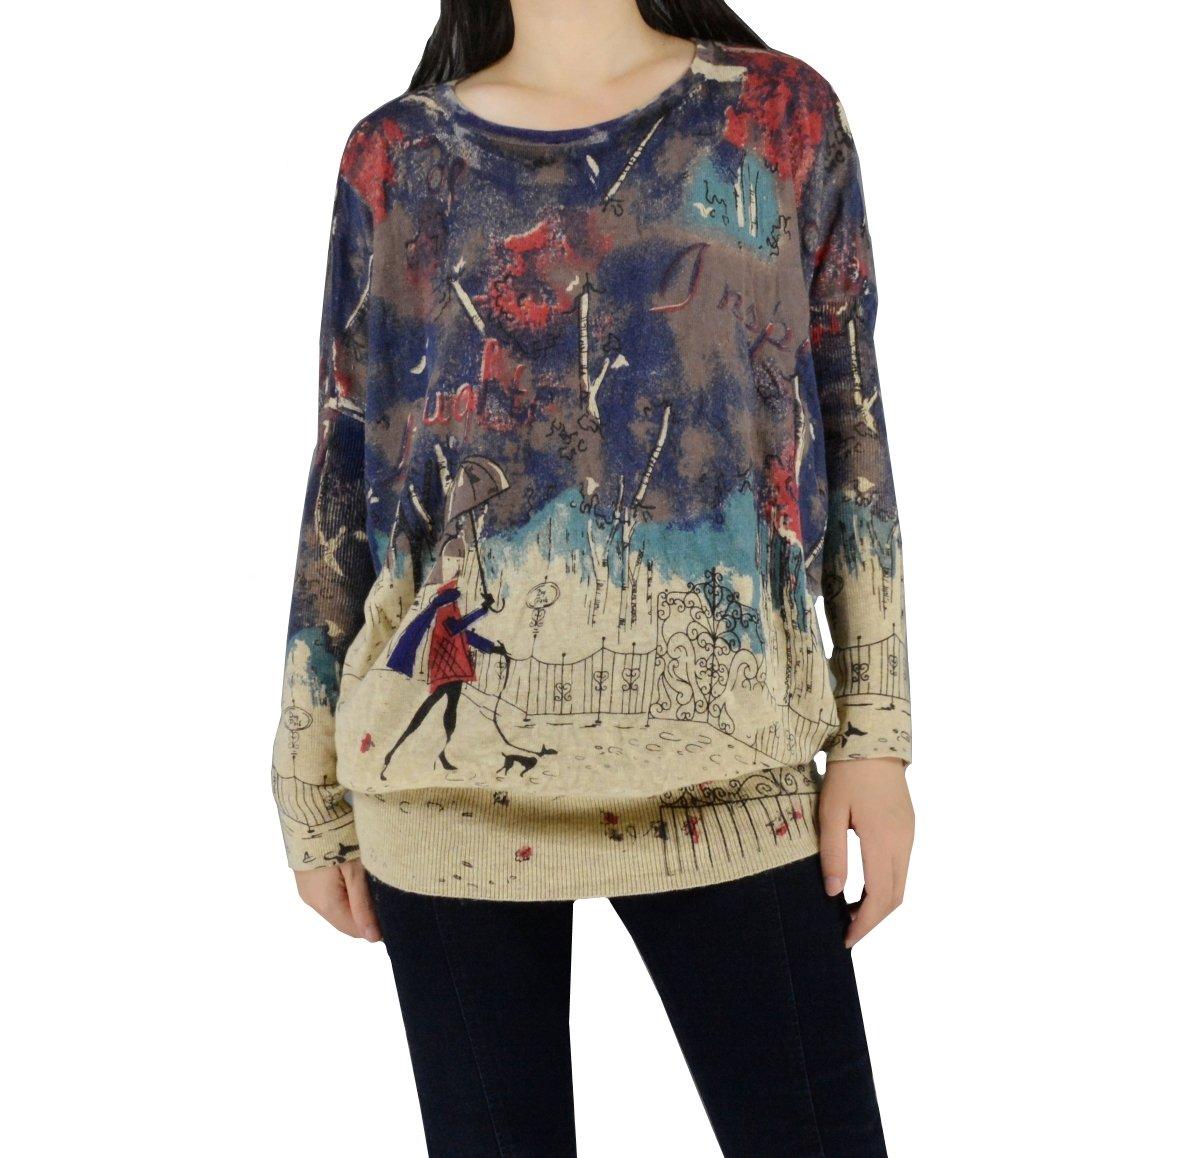 YSJ Women's Oversized Knitted Sweater Long Sleeves Baggy Knitwear Tops (One Size, Brown)